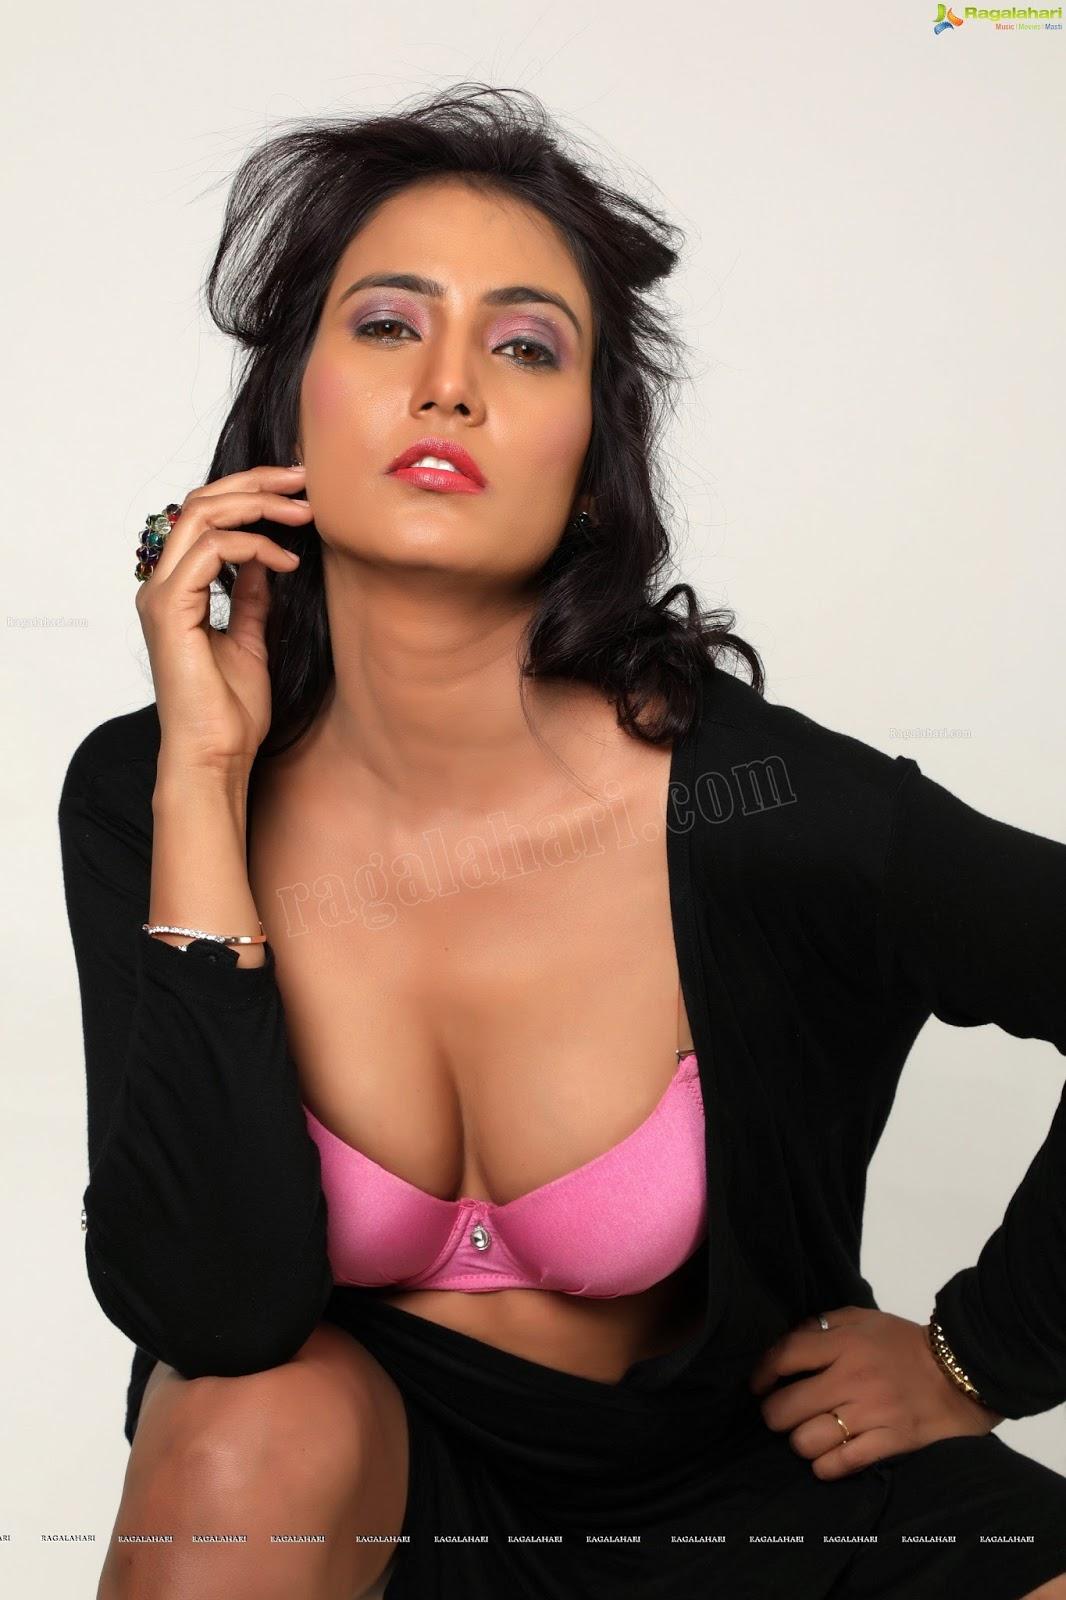 Telugu Actress Hot Photos Vijaya Maheshwari Hot Photos-6408